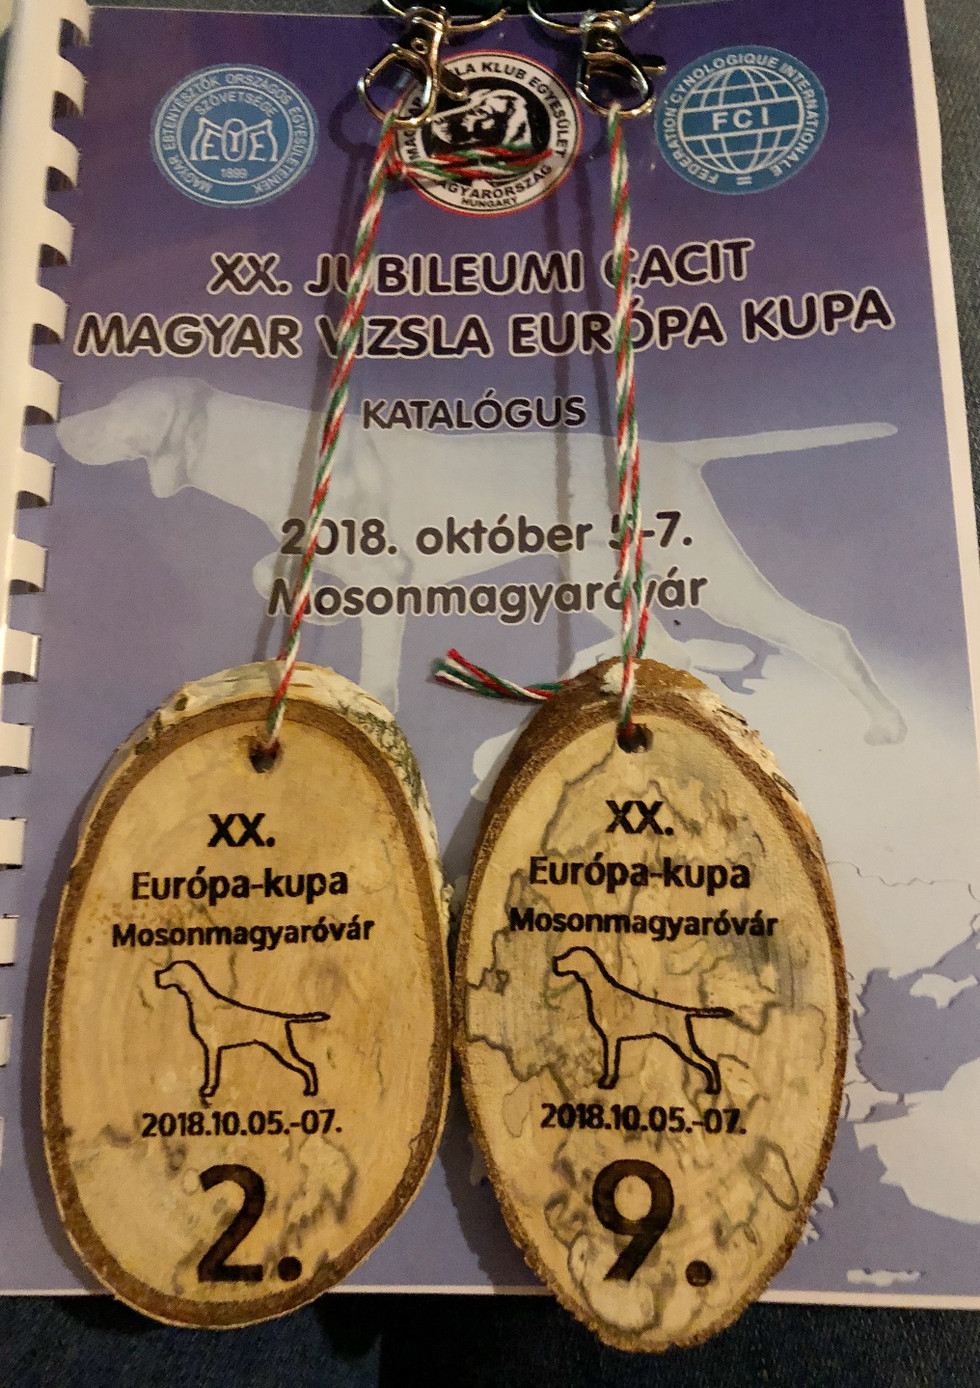 European Cup 5-7 October 2018 - Hungary